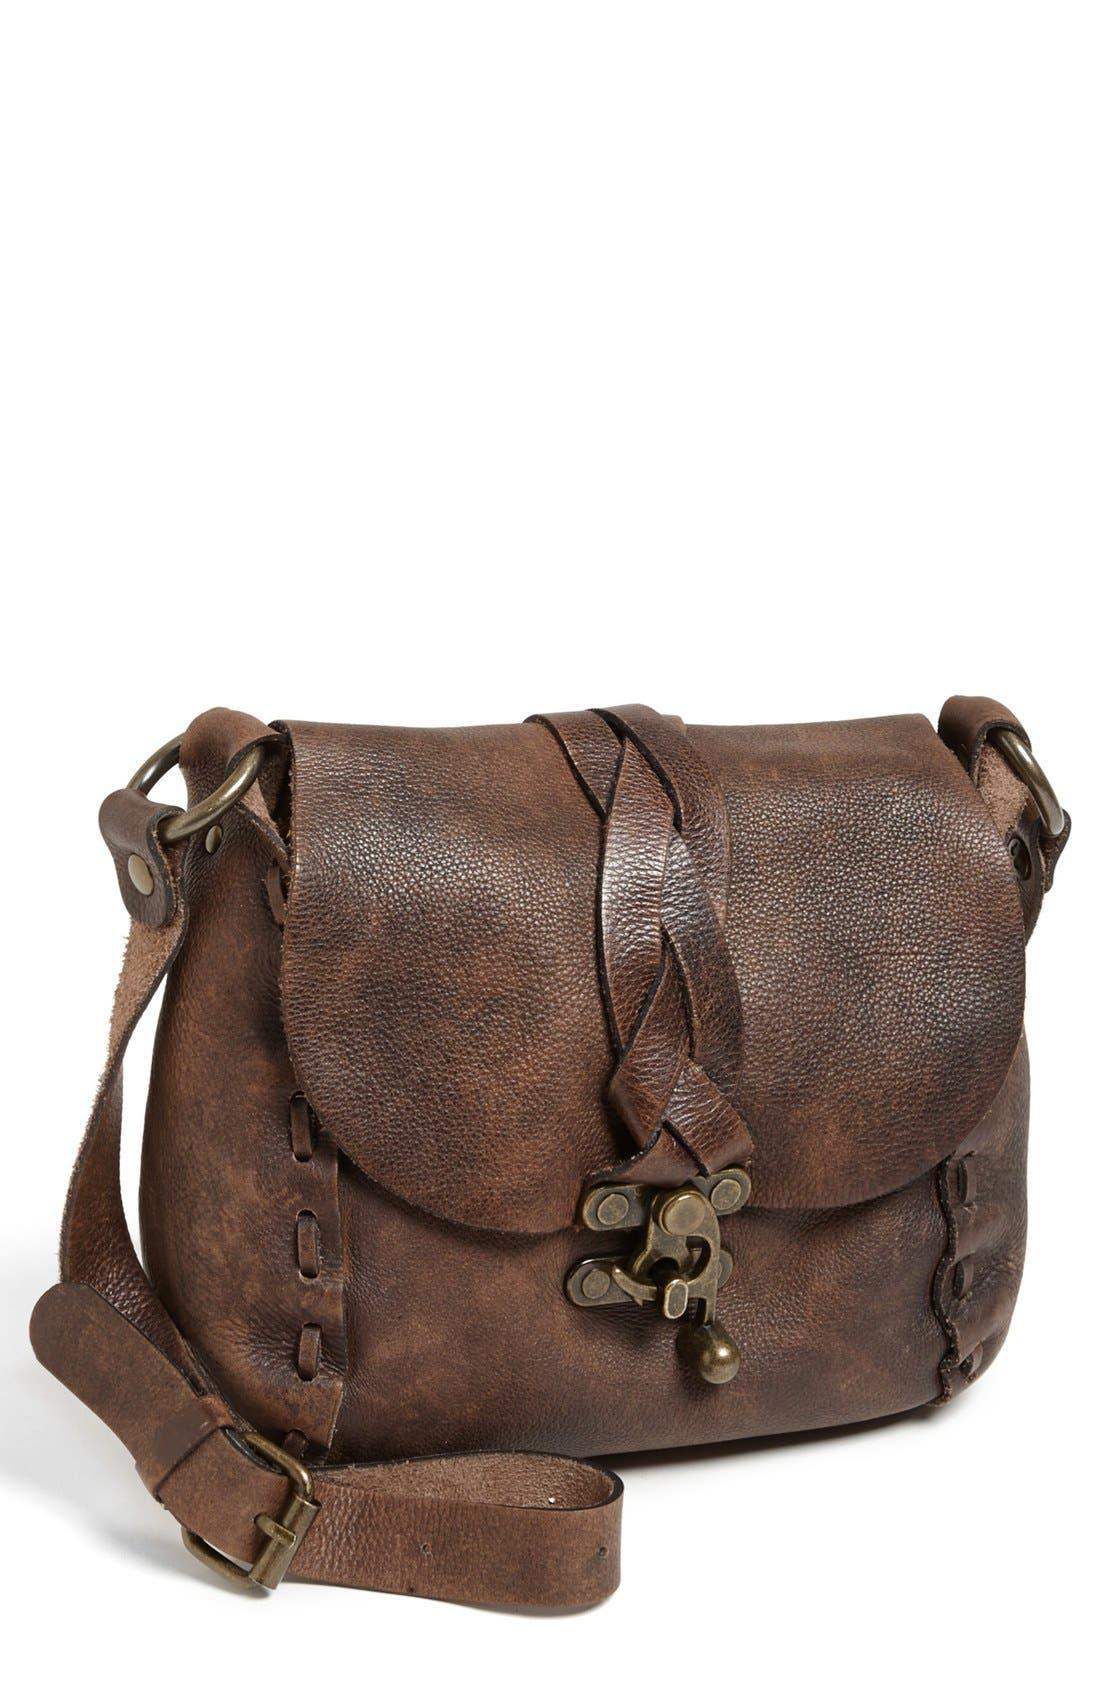 Alternate Image 1 Selected - Patricia Nash 'Serrone' Shoulder Bag, Small